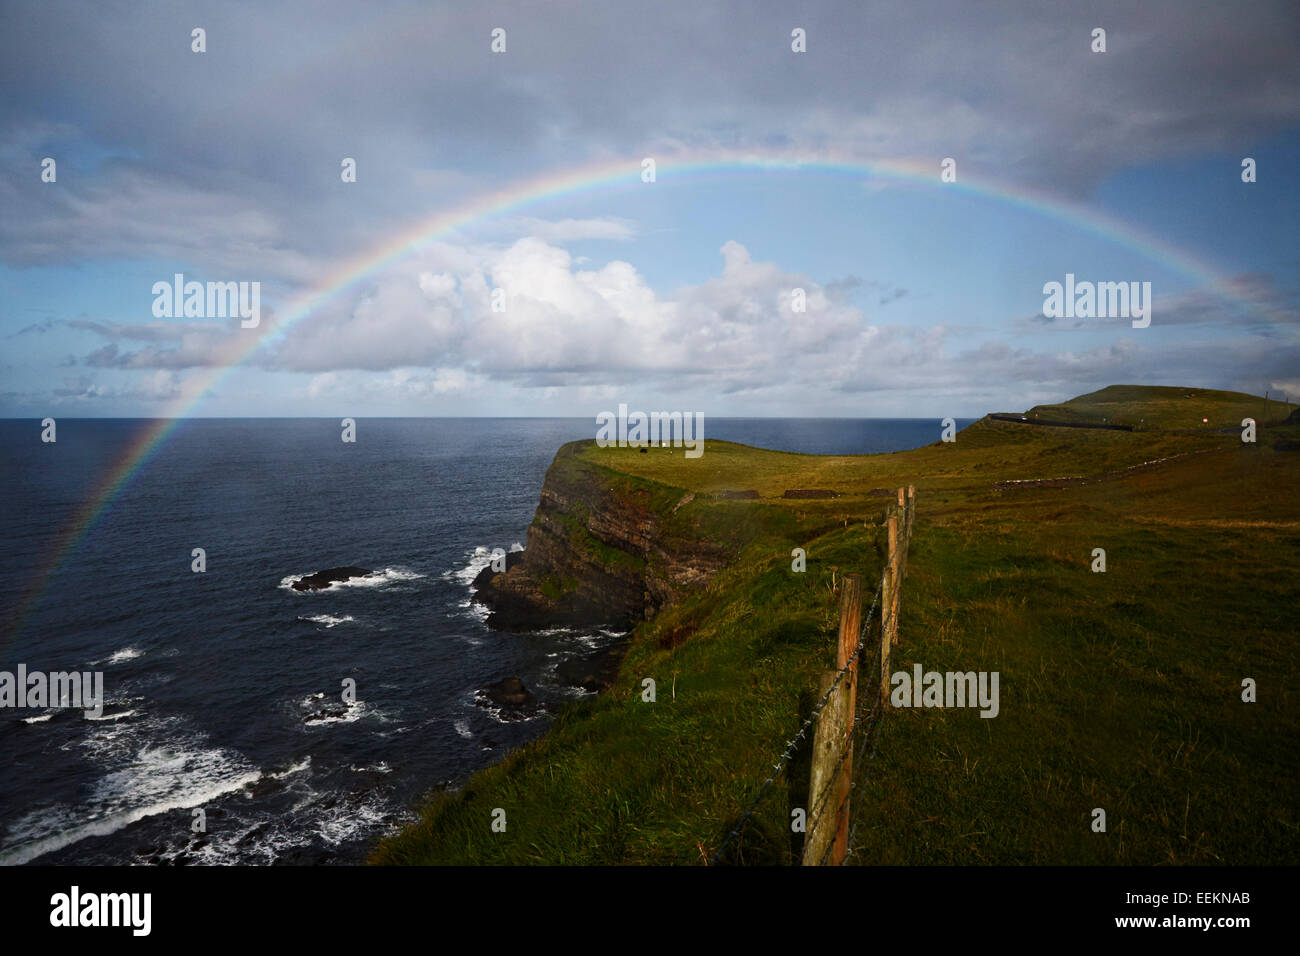 large rainbow in the rain on the north coast of Ireland - Stock Image